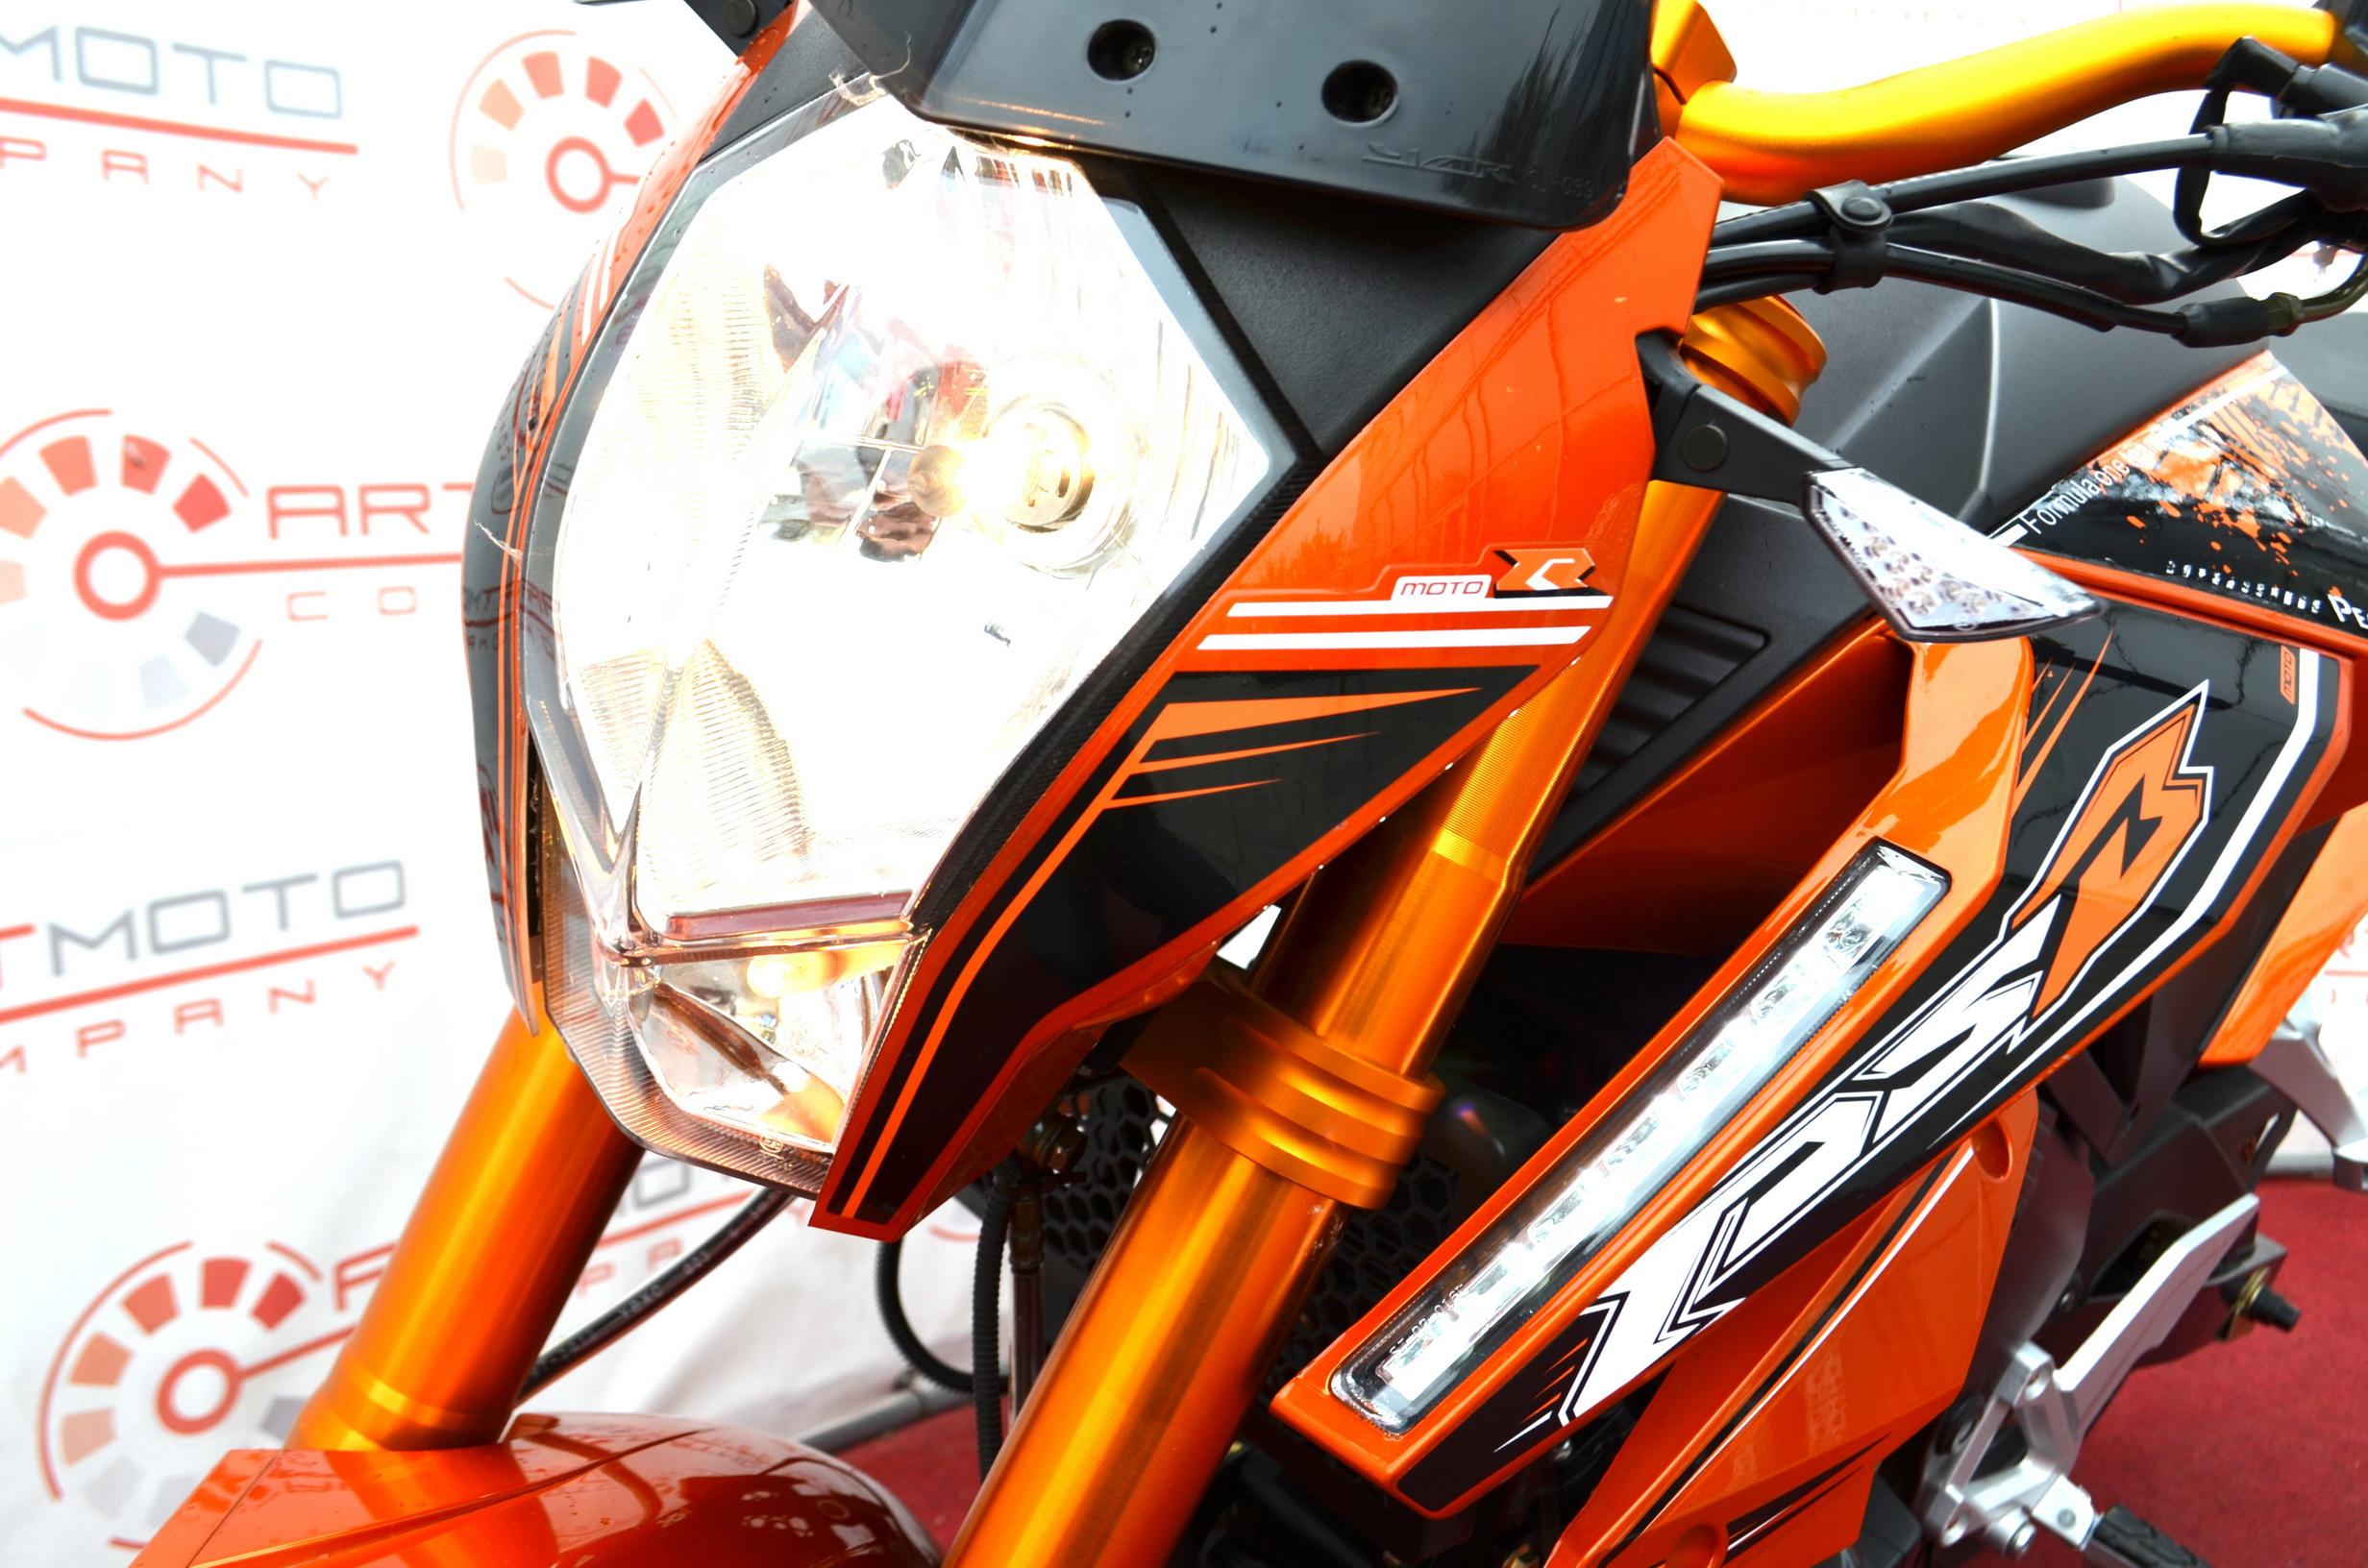 МОТОЦИКЛ BASHAN PSB 250 Orange ― Артмото - купить квадроцикл в украине и харькове, мотоцикл, снегоход, скутер, мопед, электромобиль